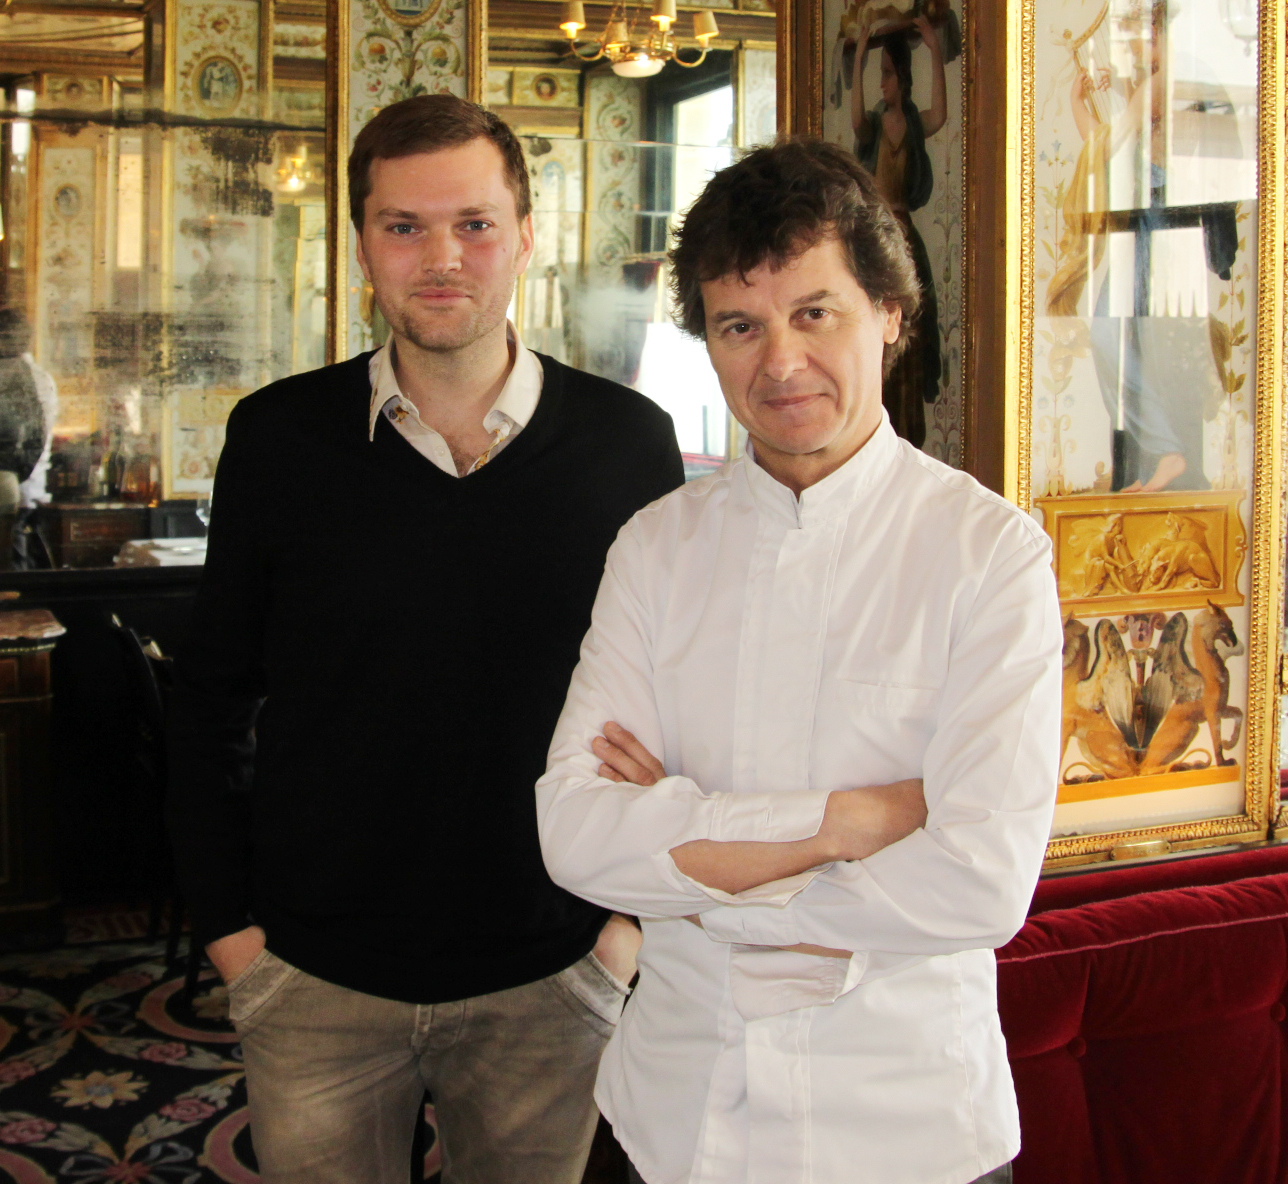 La cuisine de bernard mes interviews culinaires guy for Cuisine de bernard